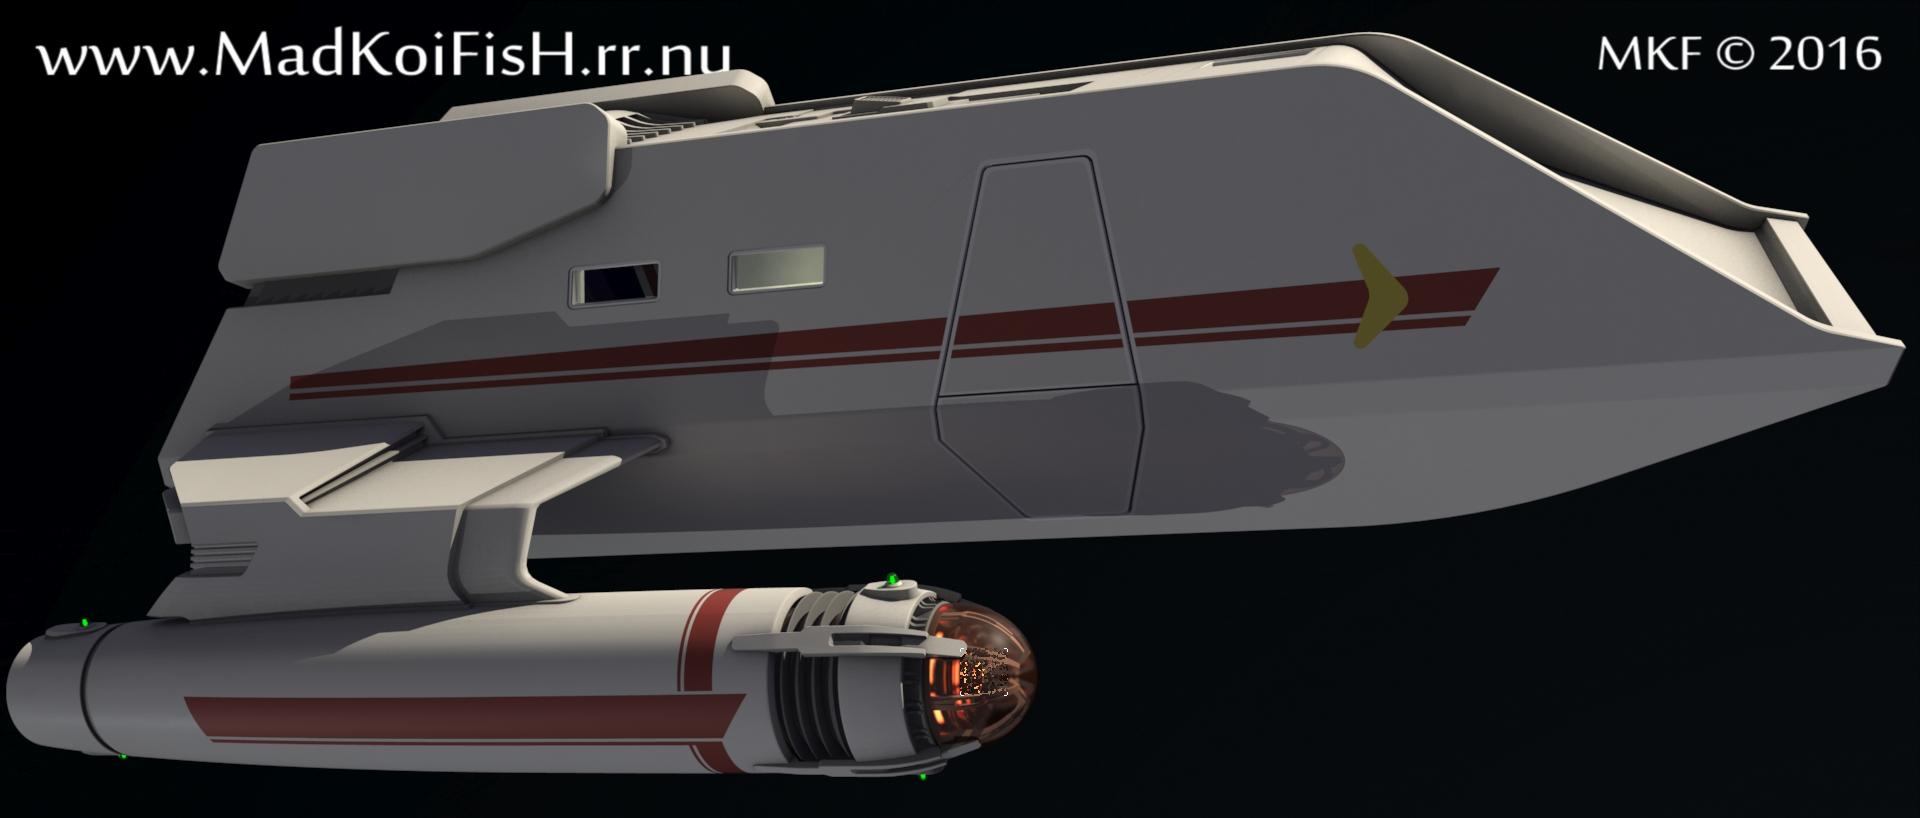 tos-shuttle-031.jpg